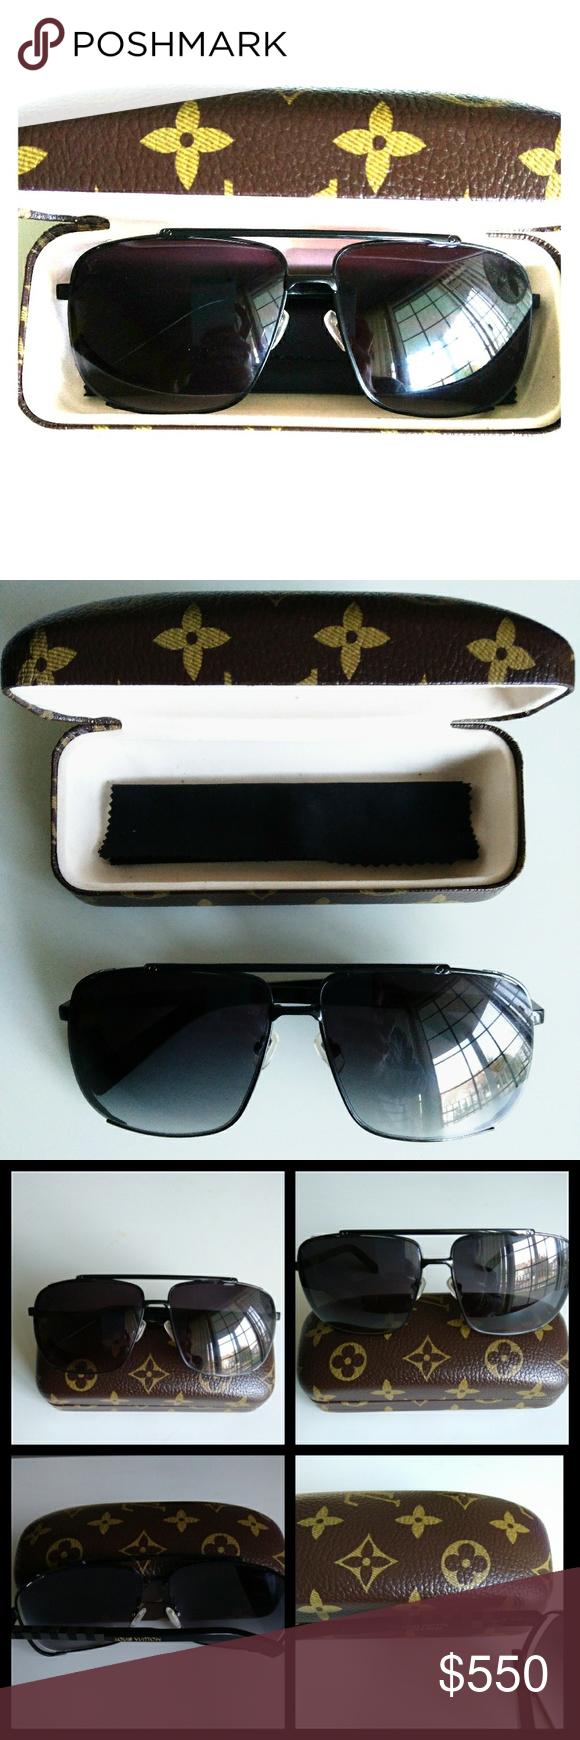 31660caa8a8d Louis Vuitton Attitude Pilot Sunglasses Z0537U These aviator-style  sunglasses feature Louis Vuitton s historic Damier